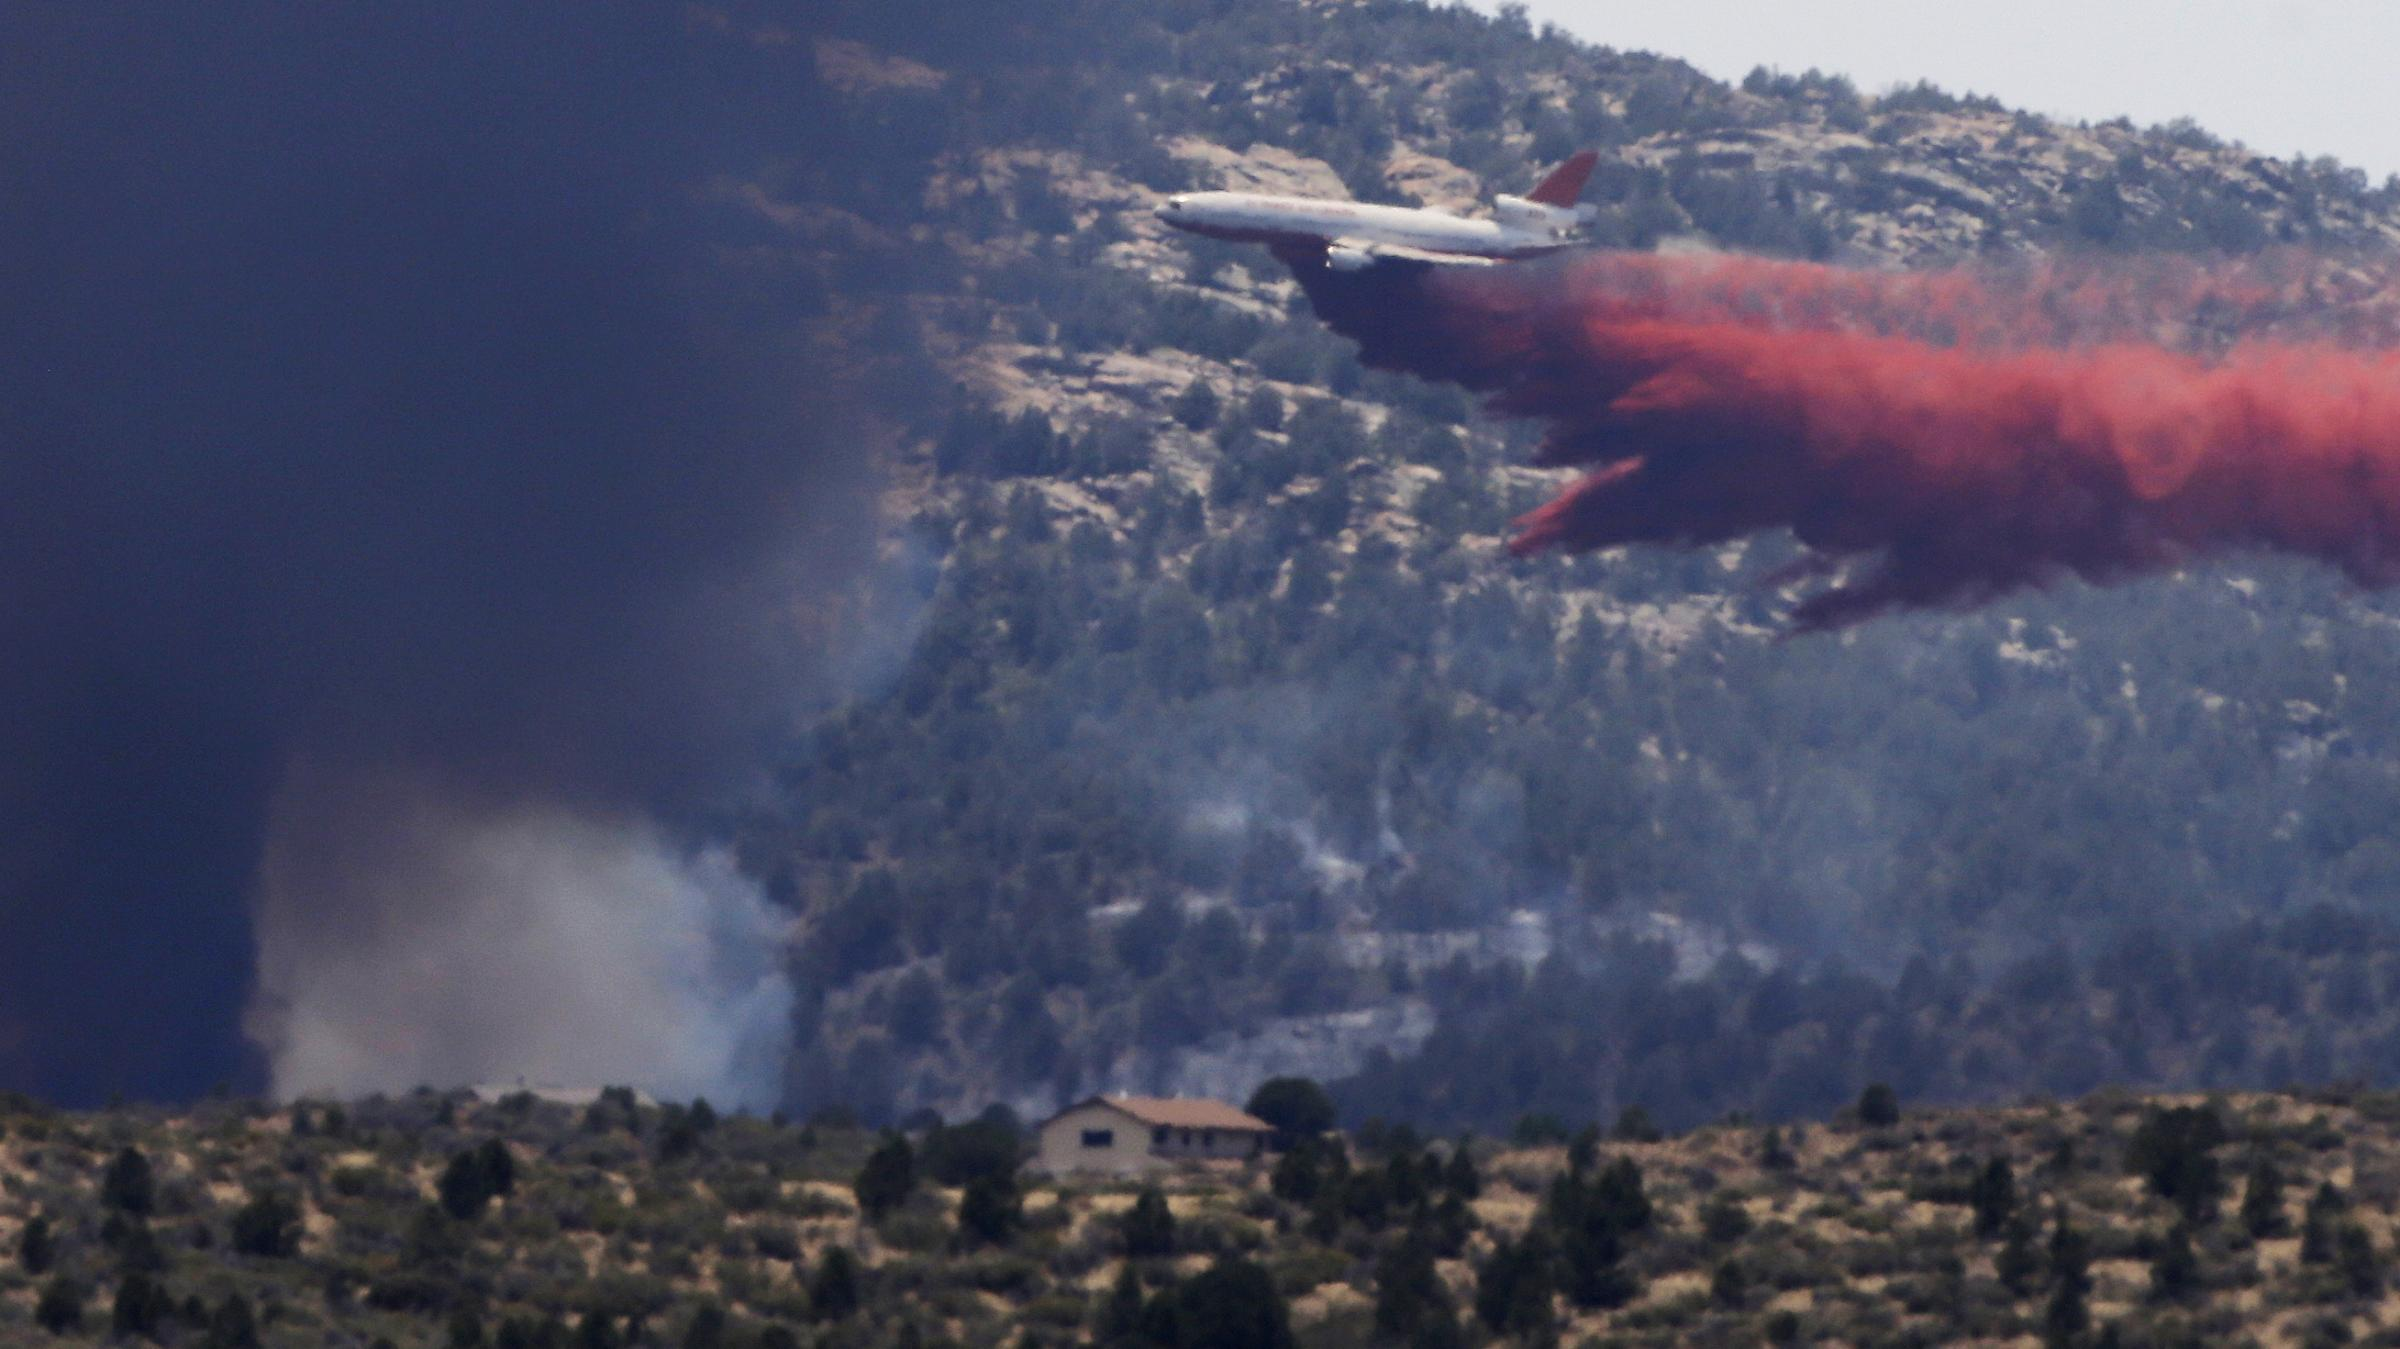 aerial firefighting Wildfire suppression using air tankers at-802f fireboss amphibious air tractor 802 fire boss en tareas de extinción de incendios forestales aviões air tracto.